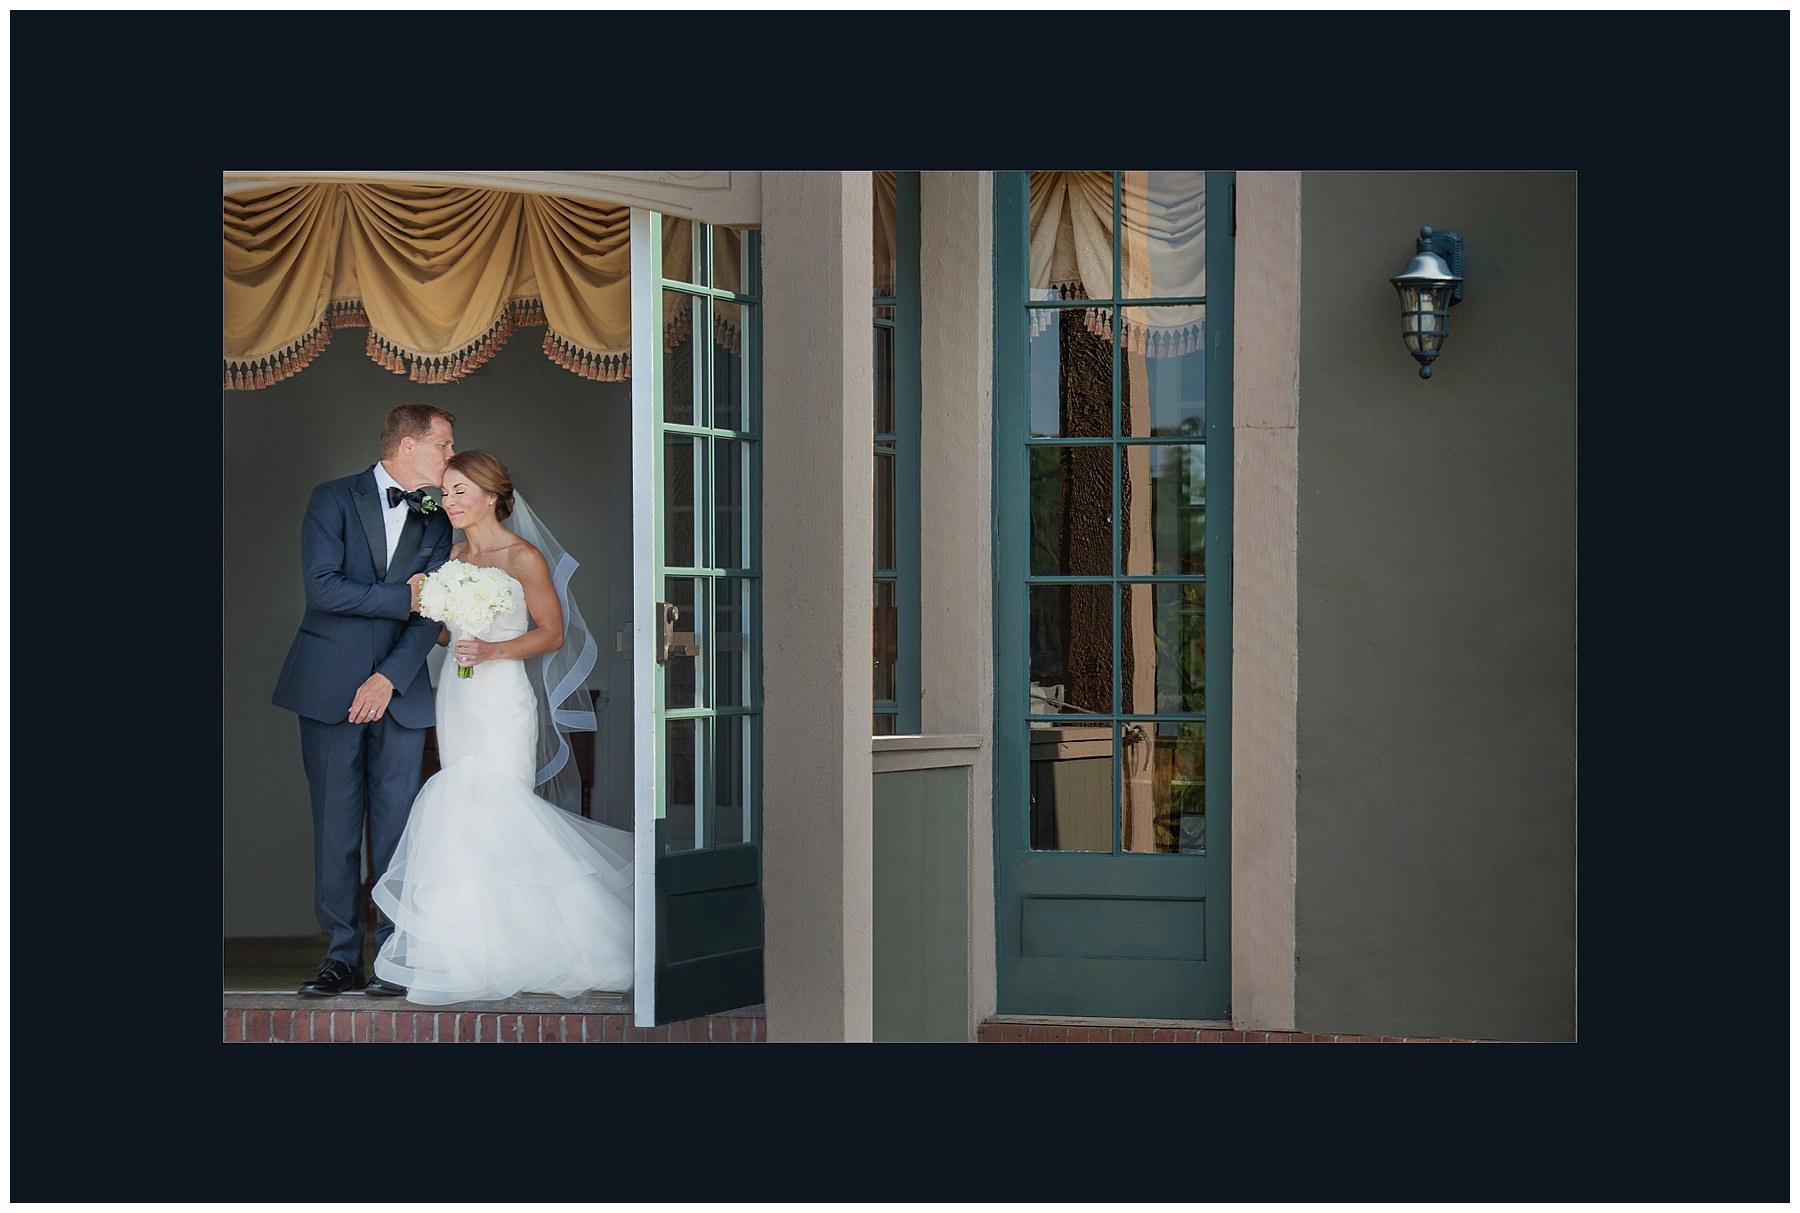 Award+Winning+Wedding+Photographers,+Two+Adventurous+Souls_0002.jpg